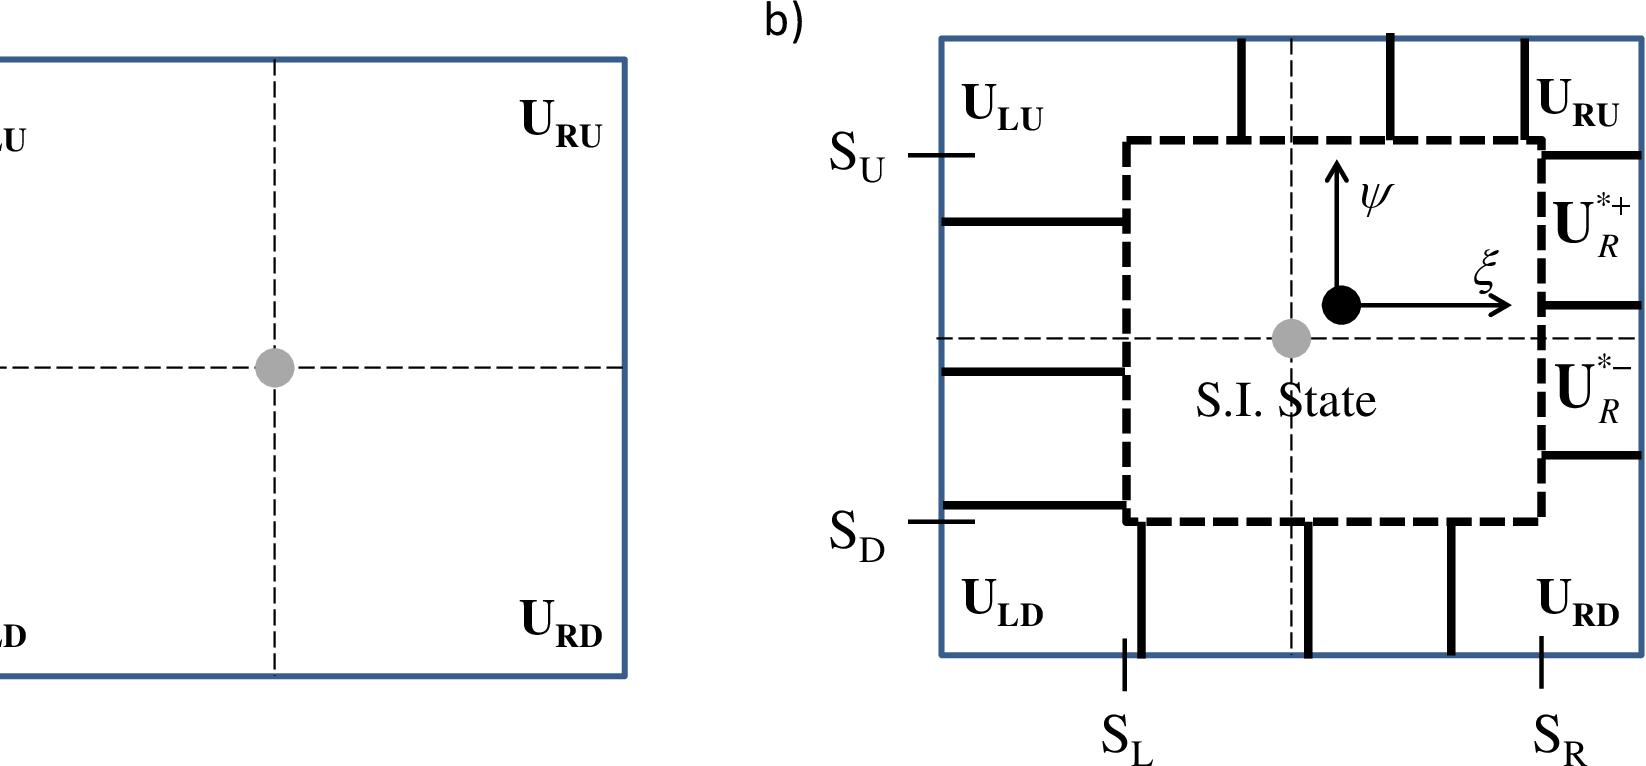 A subluminal relativistic magnetohydrodynamics scheme with